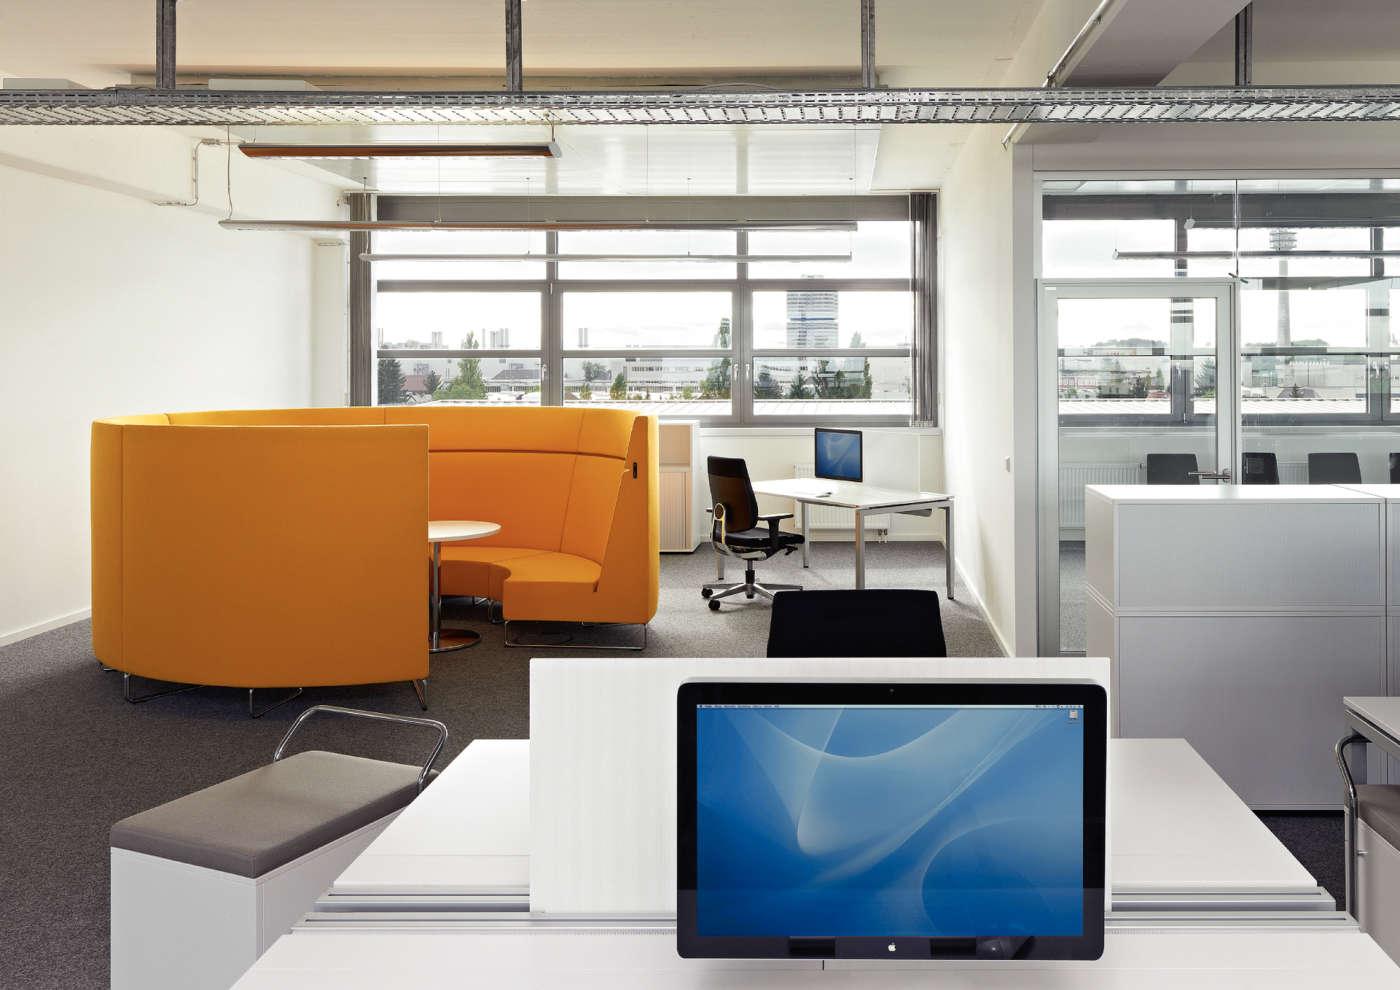 VS | Büromöbel für den Lebensraum Büro